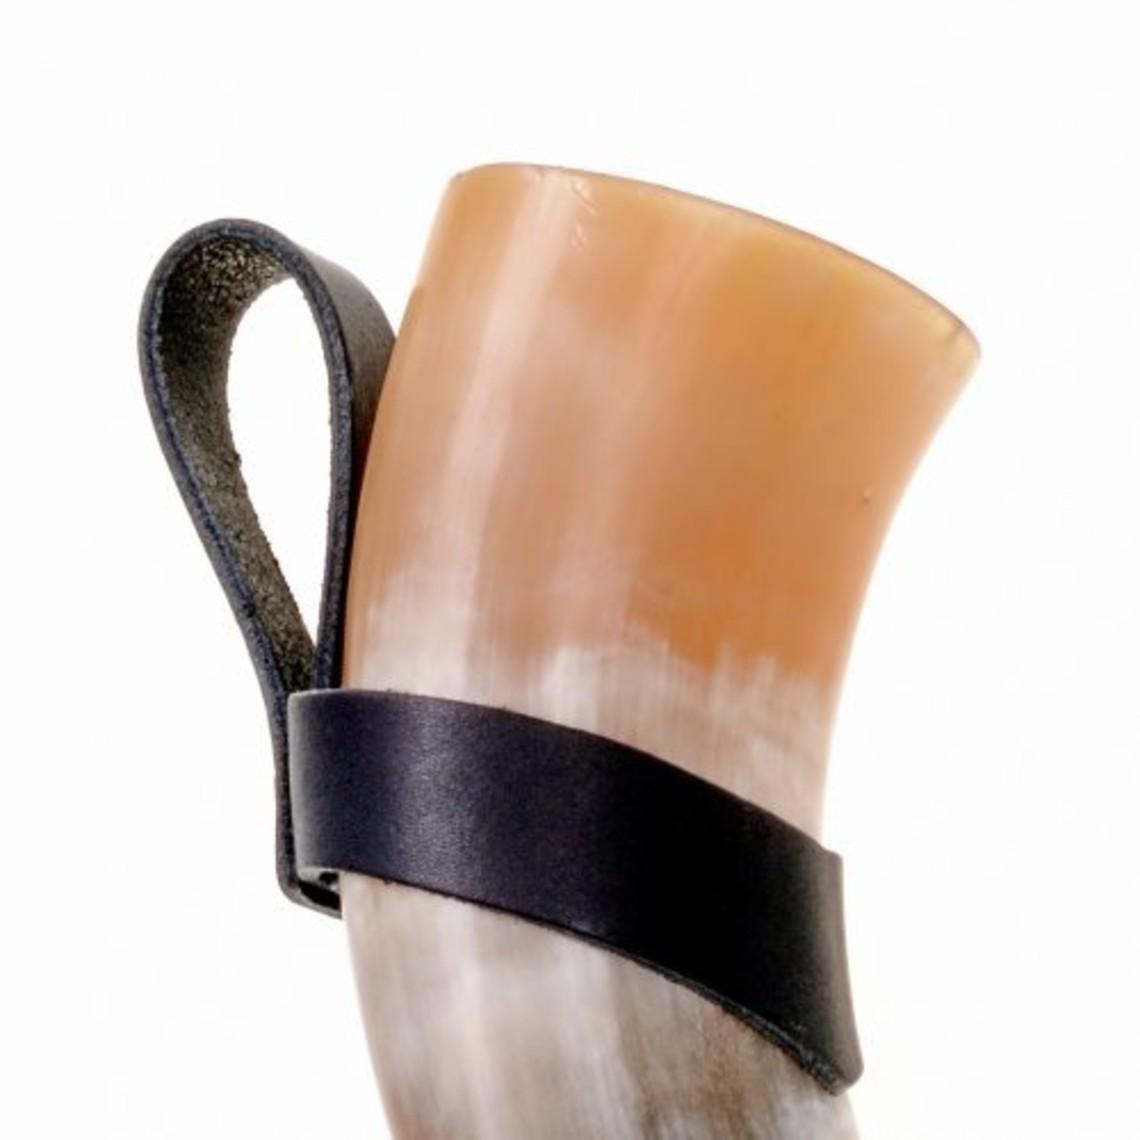 Leder Trinkhornhalter 0,3 - 0,4 L, braun